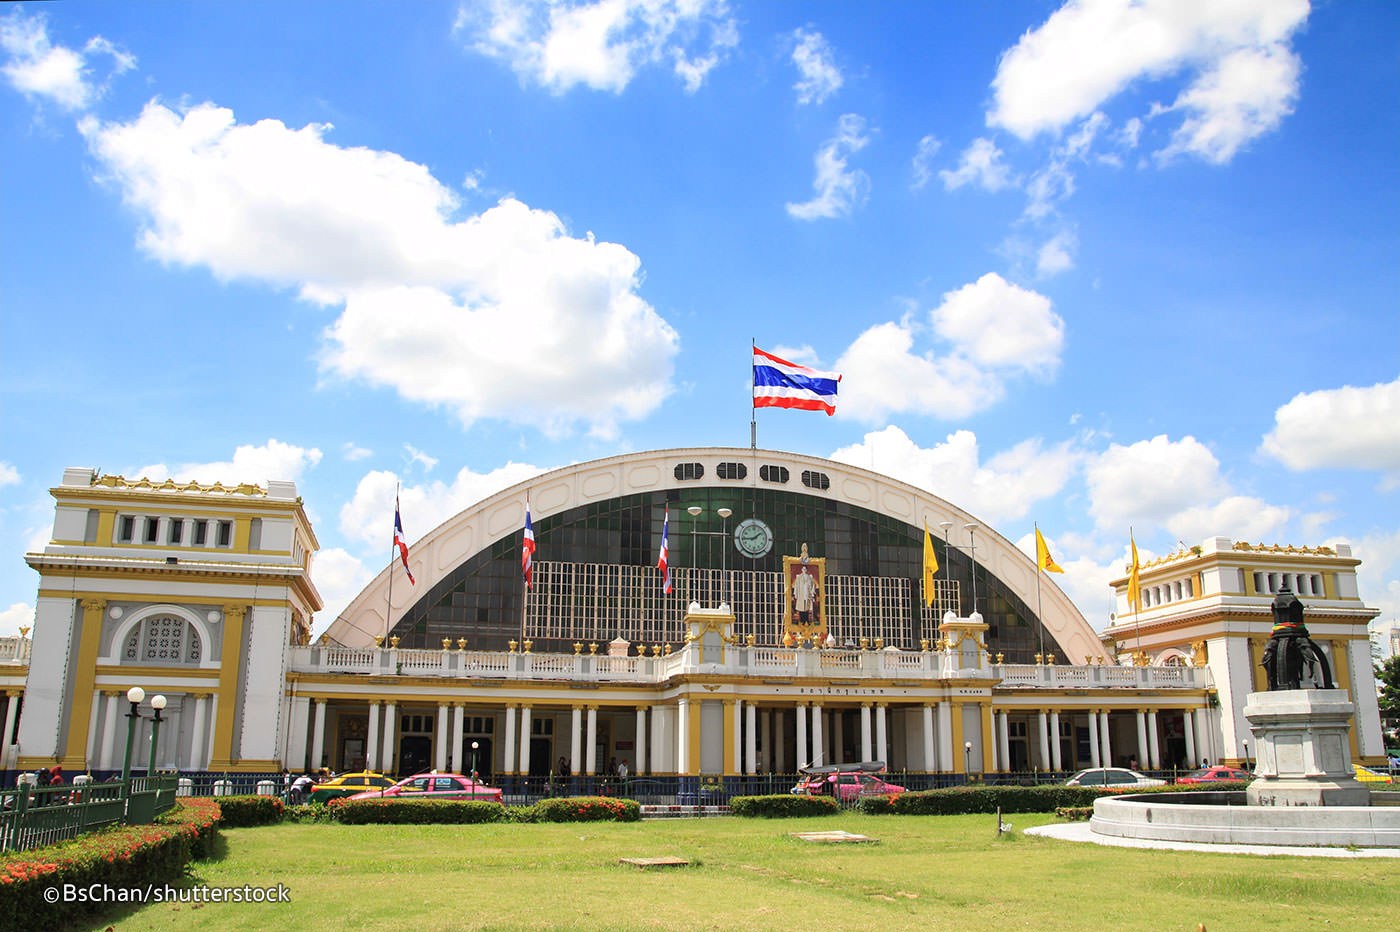 hua-lamphong-railway-station (1)